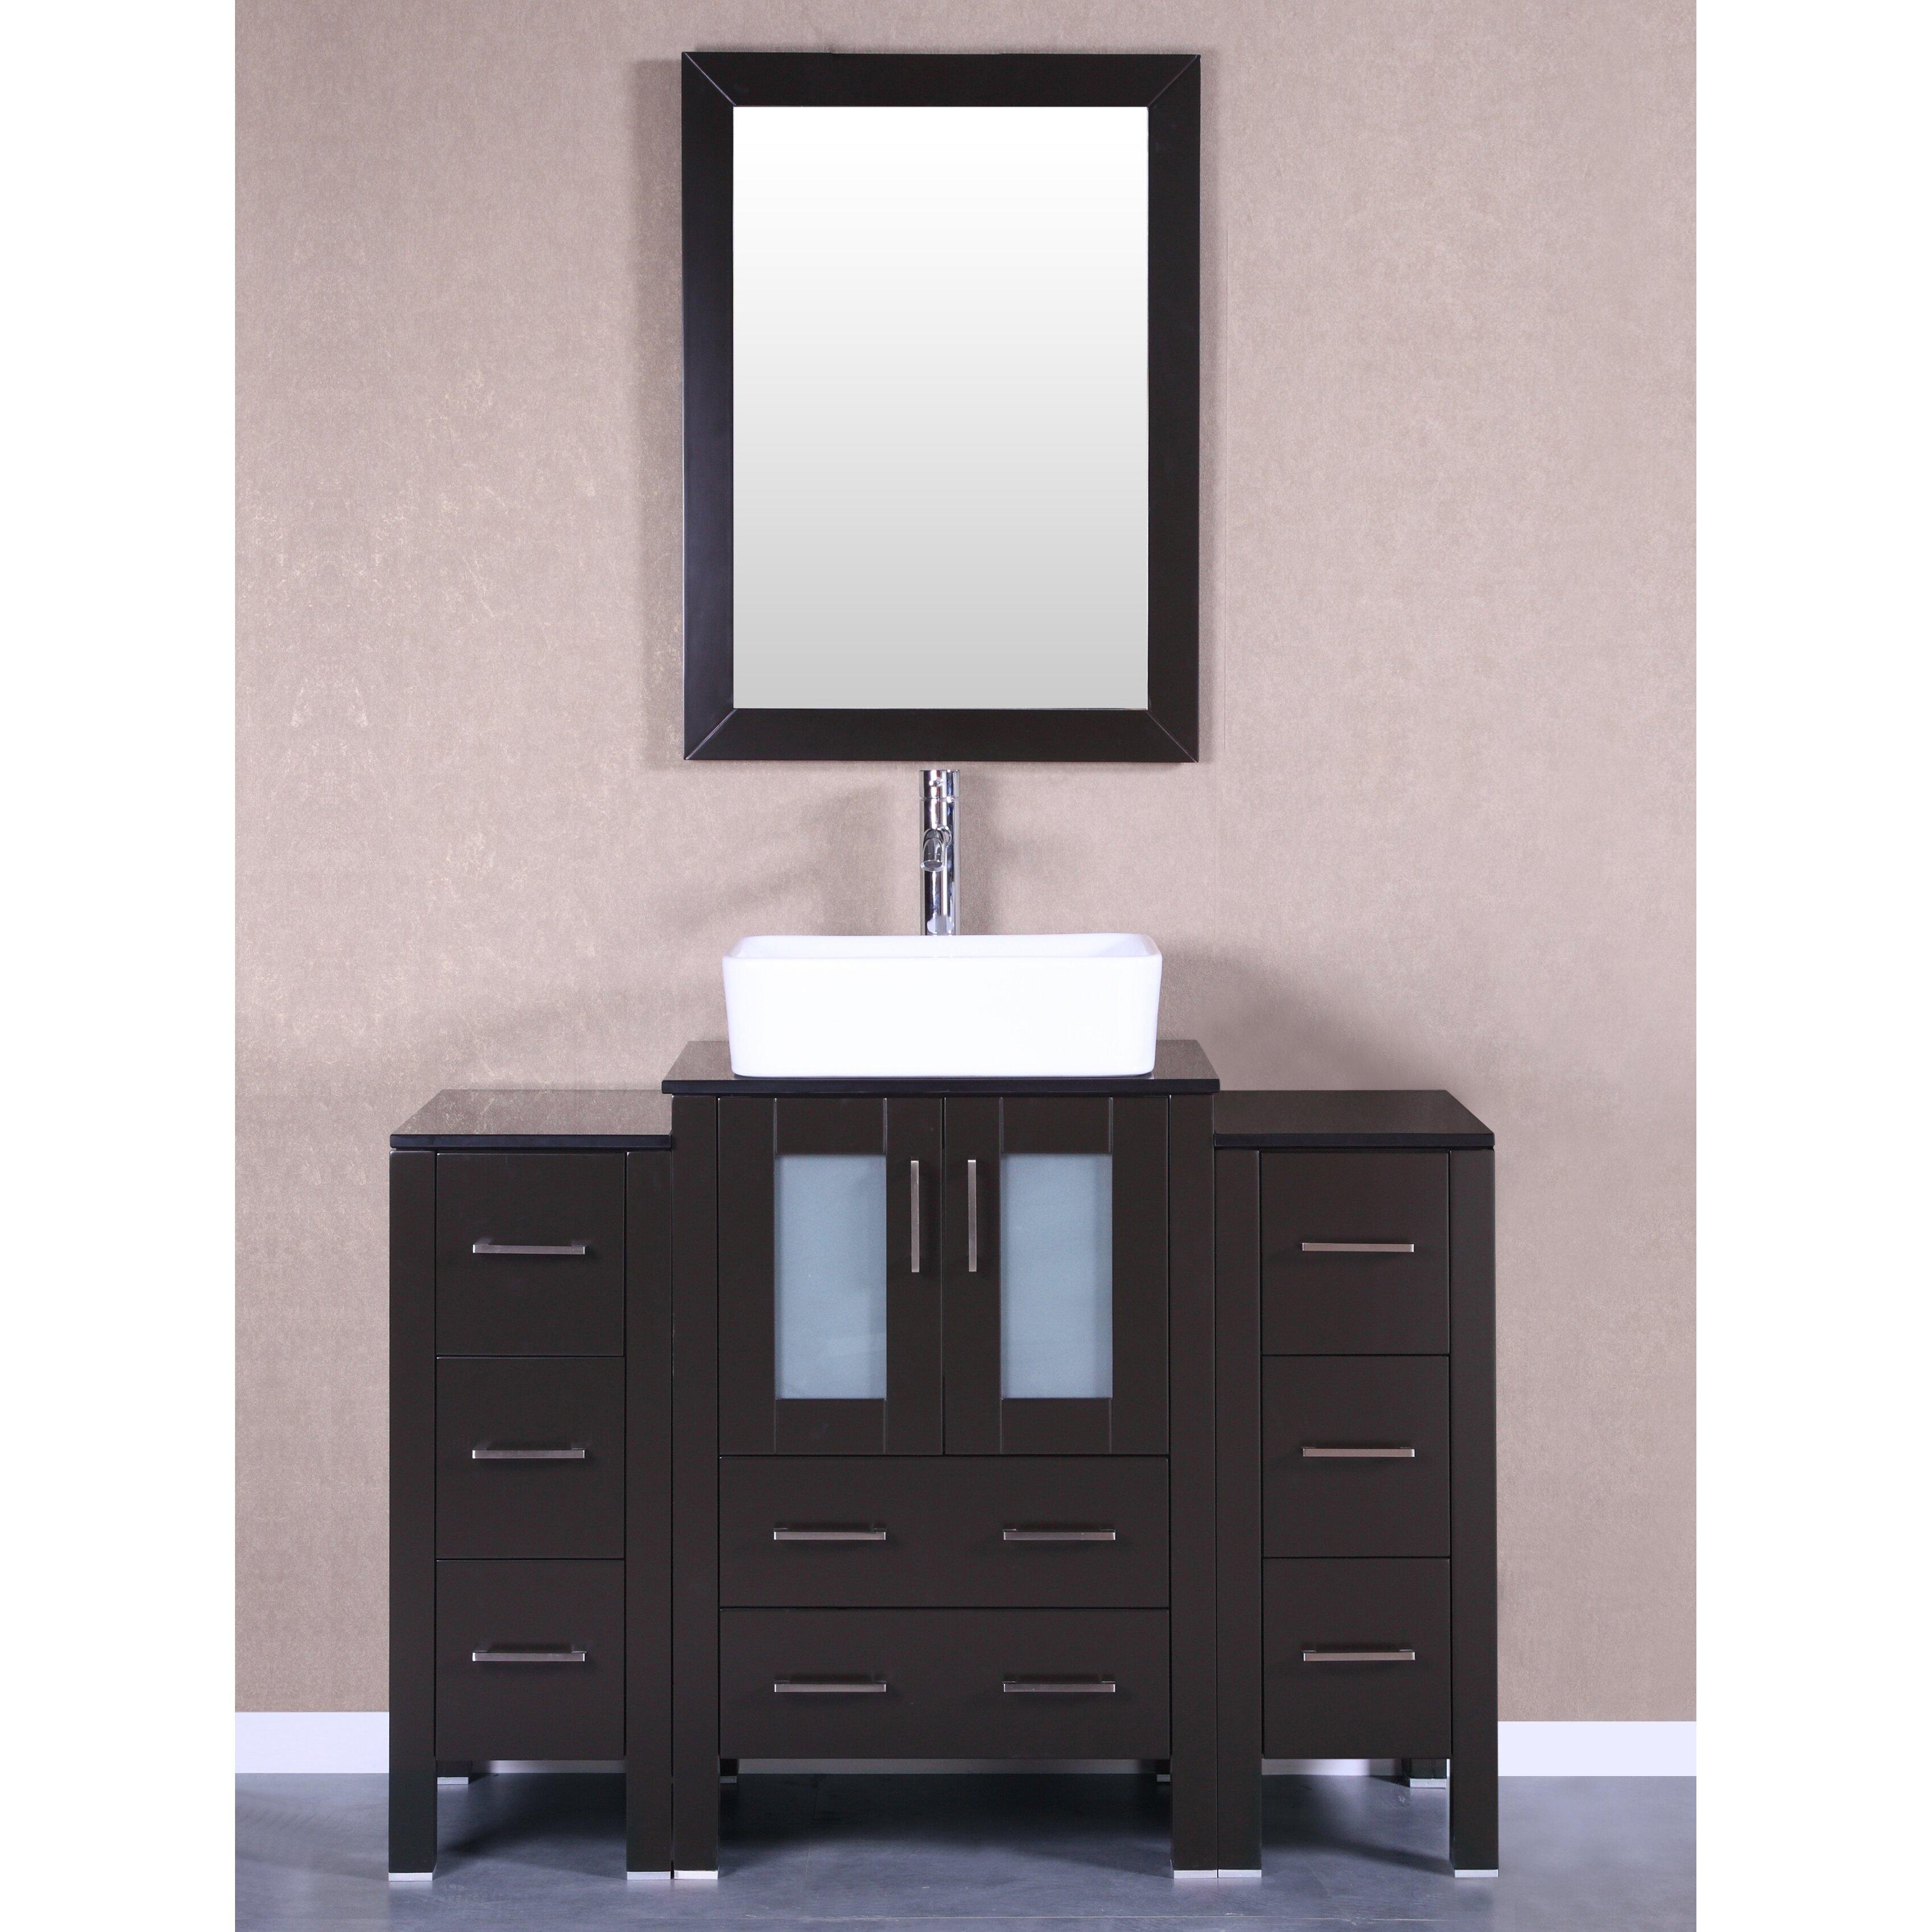 Bosconi 48 single vanity set with mirror wayfair for Vanity set with mirror